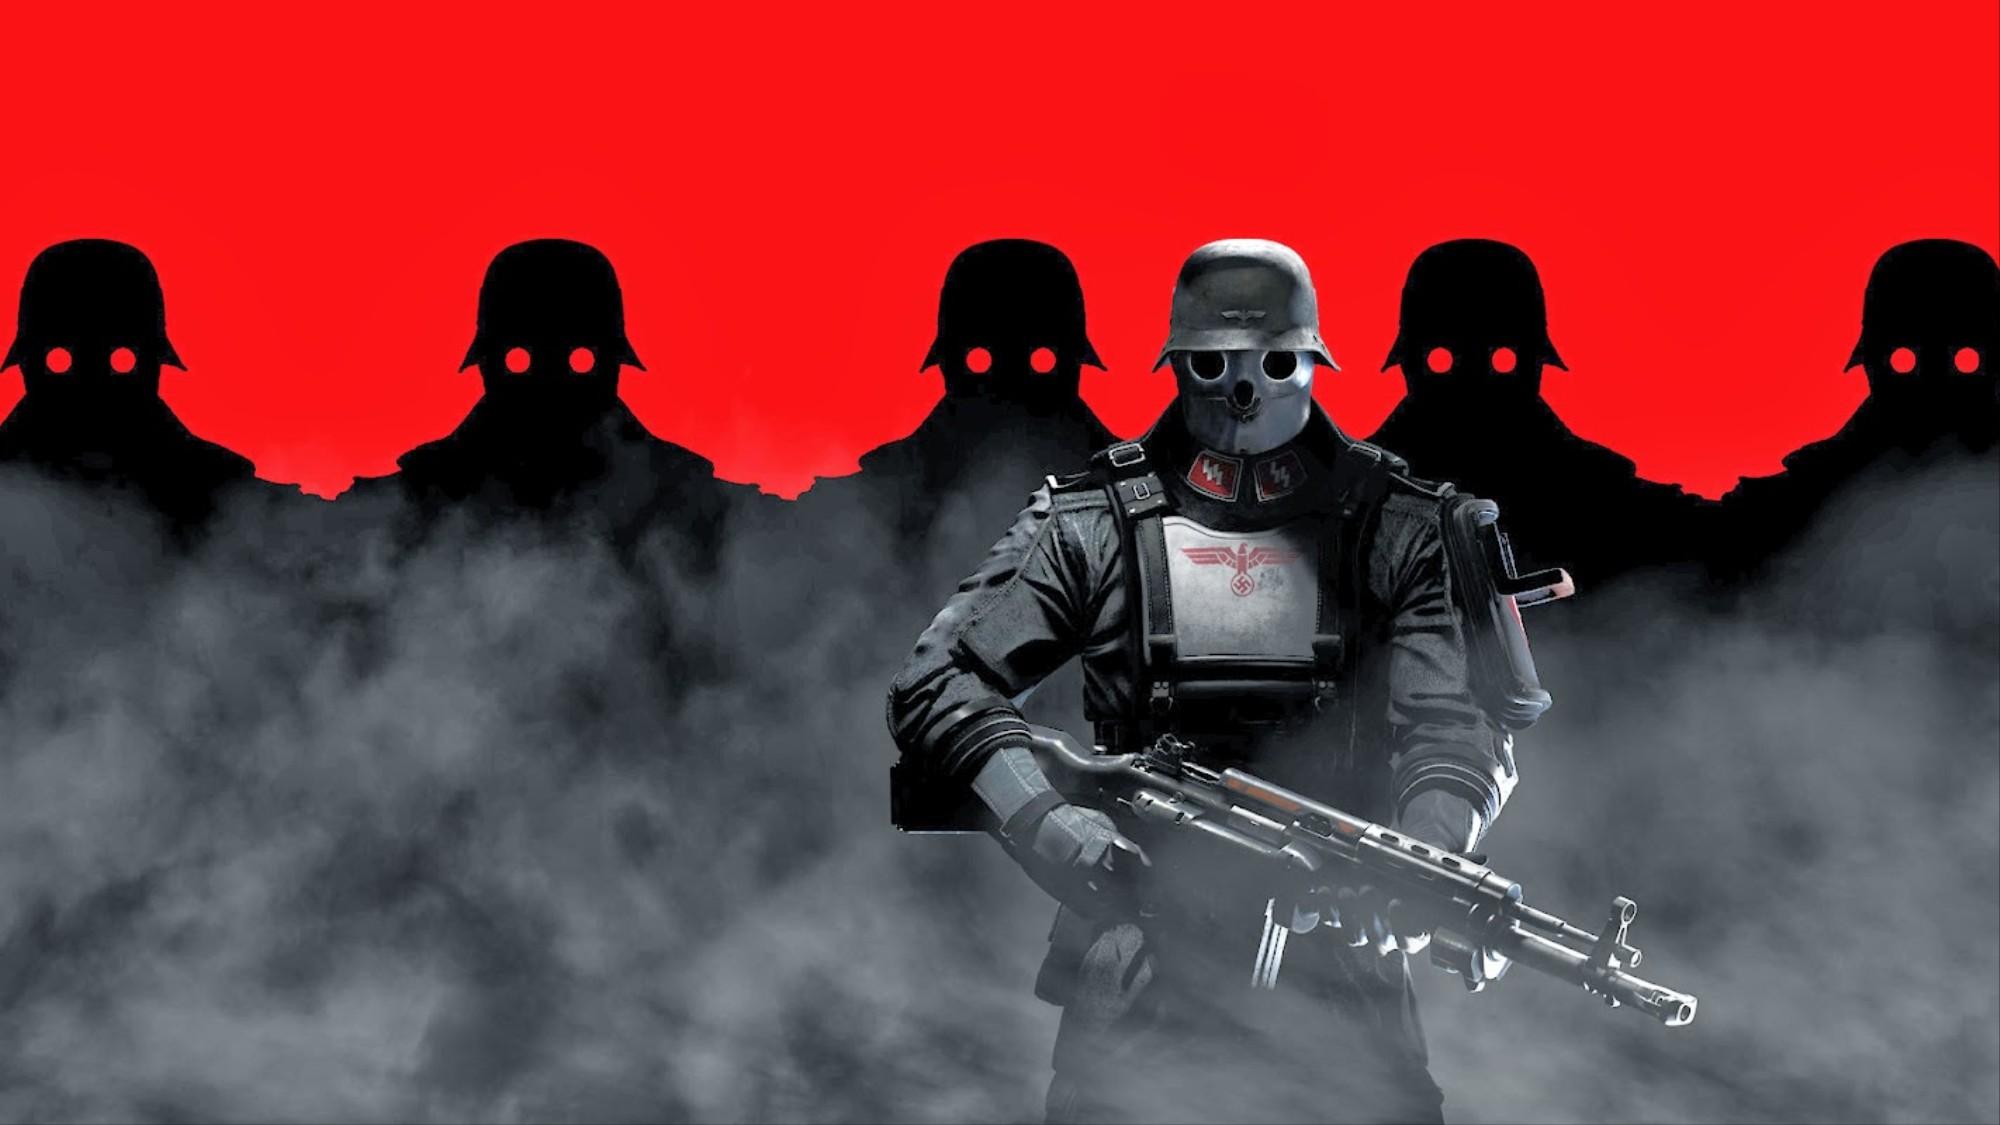 wolfenstein the new order download ocean of games